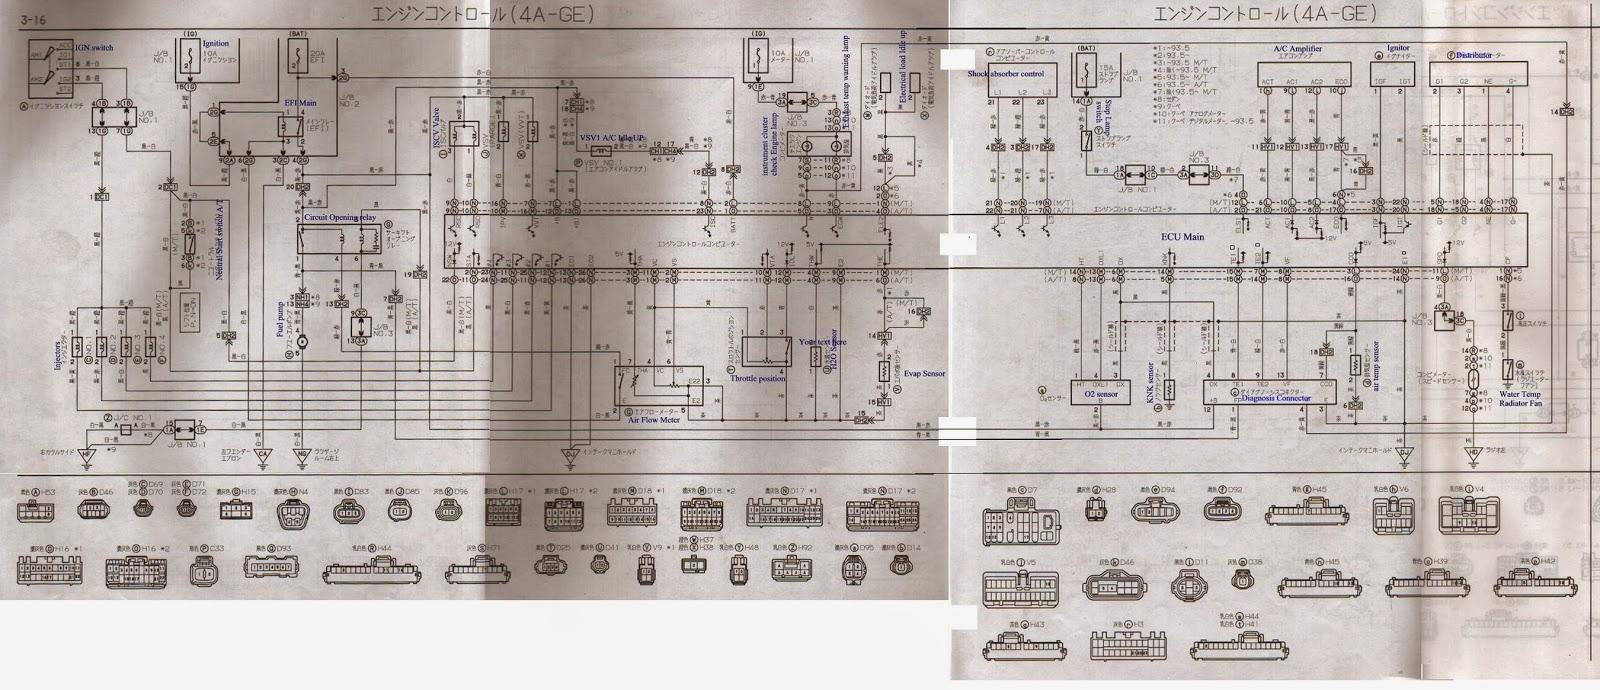 Caldina 3sgte Wiring Diagram Solar System Controller Best Library 4a Ge 20v Ae101 Ecu Pinout Toyota Pinouts Rh Blogspot